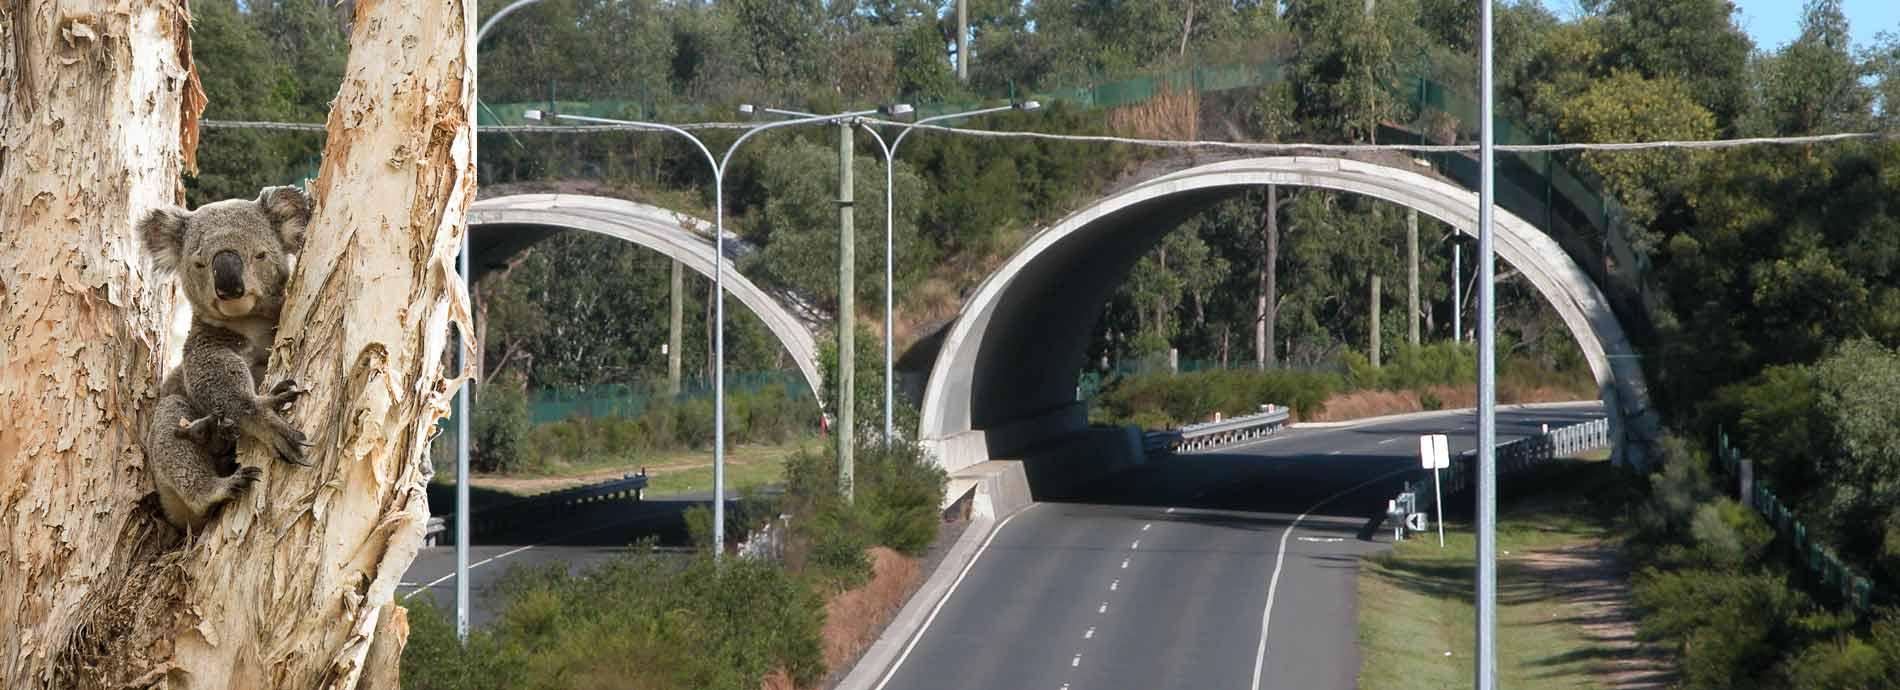 compton road wildlife corridor